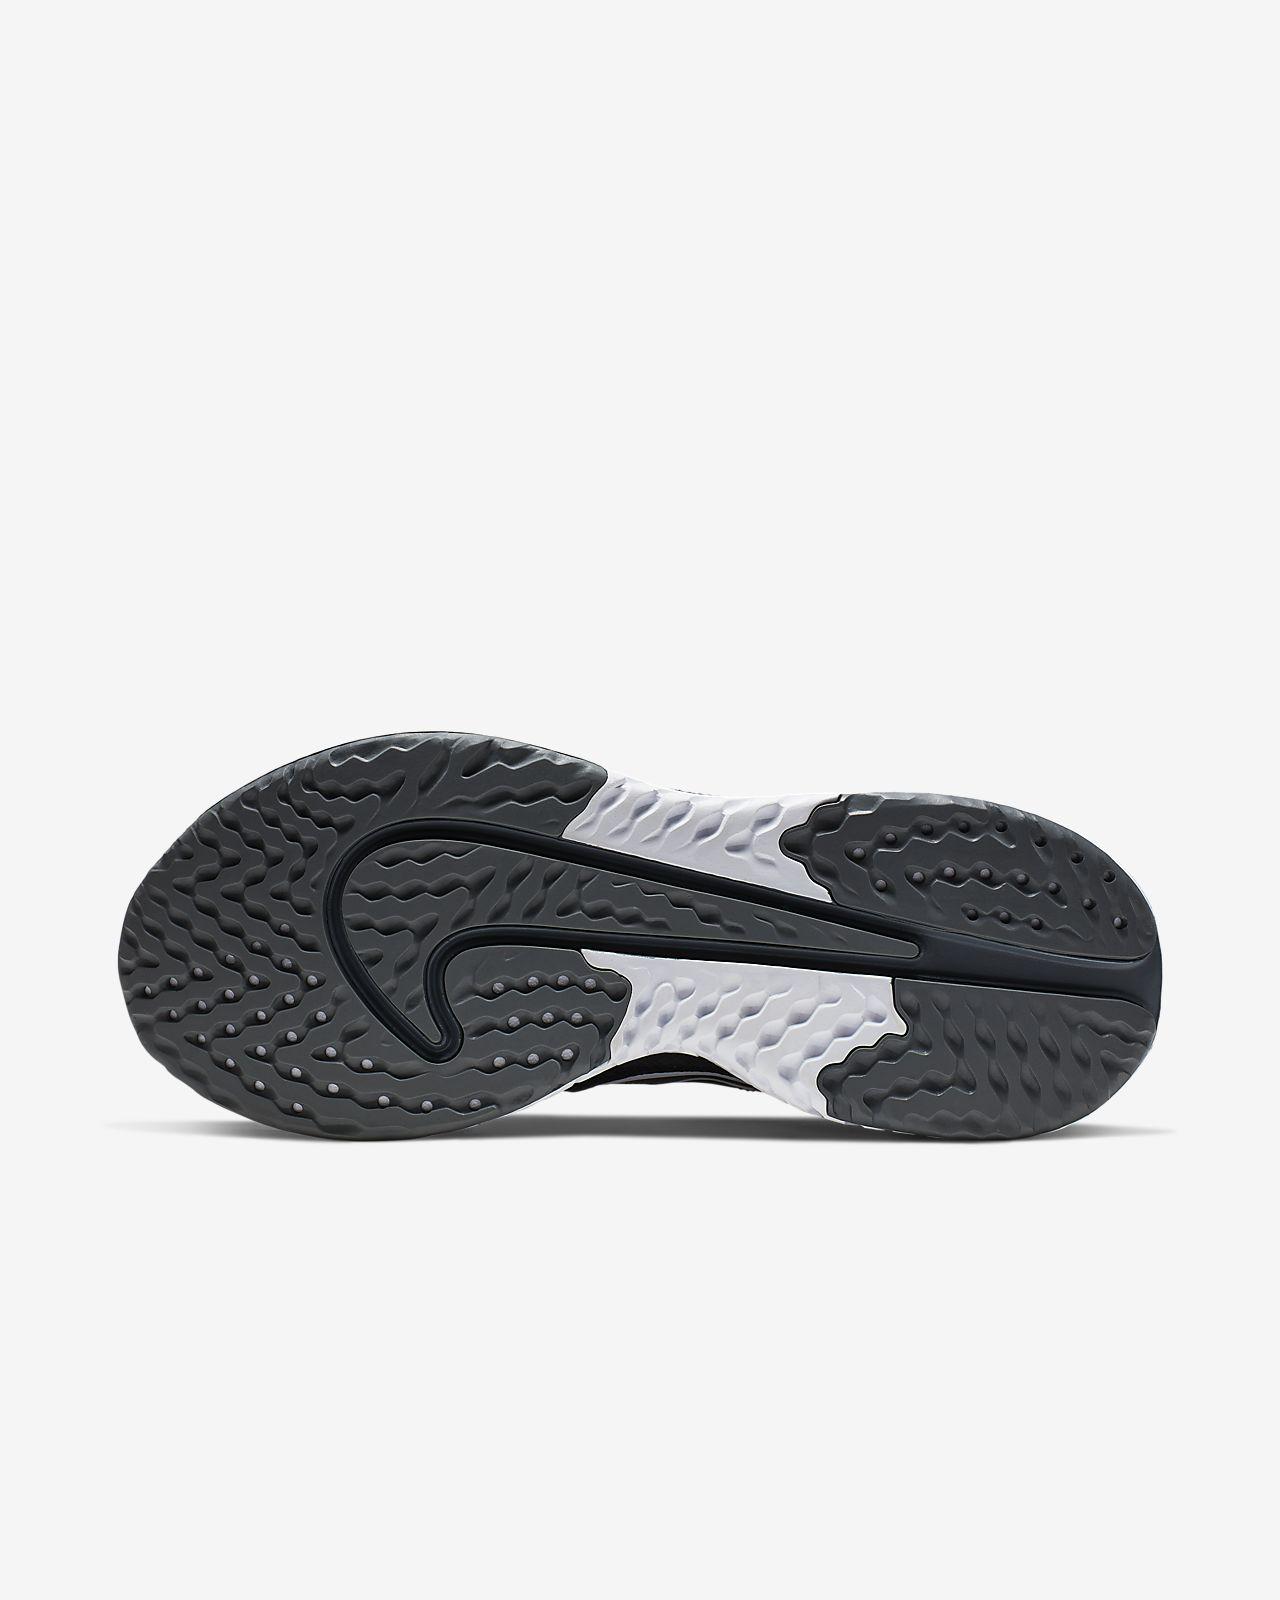 chaussure nike legend react